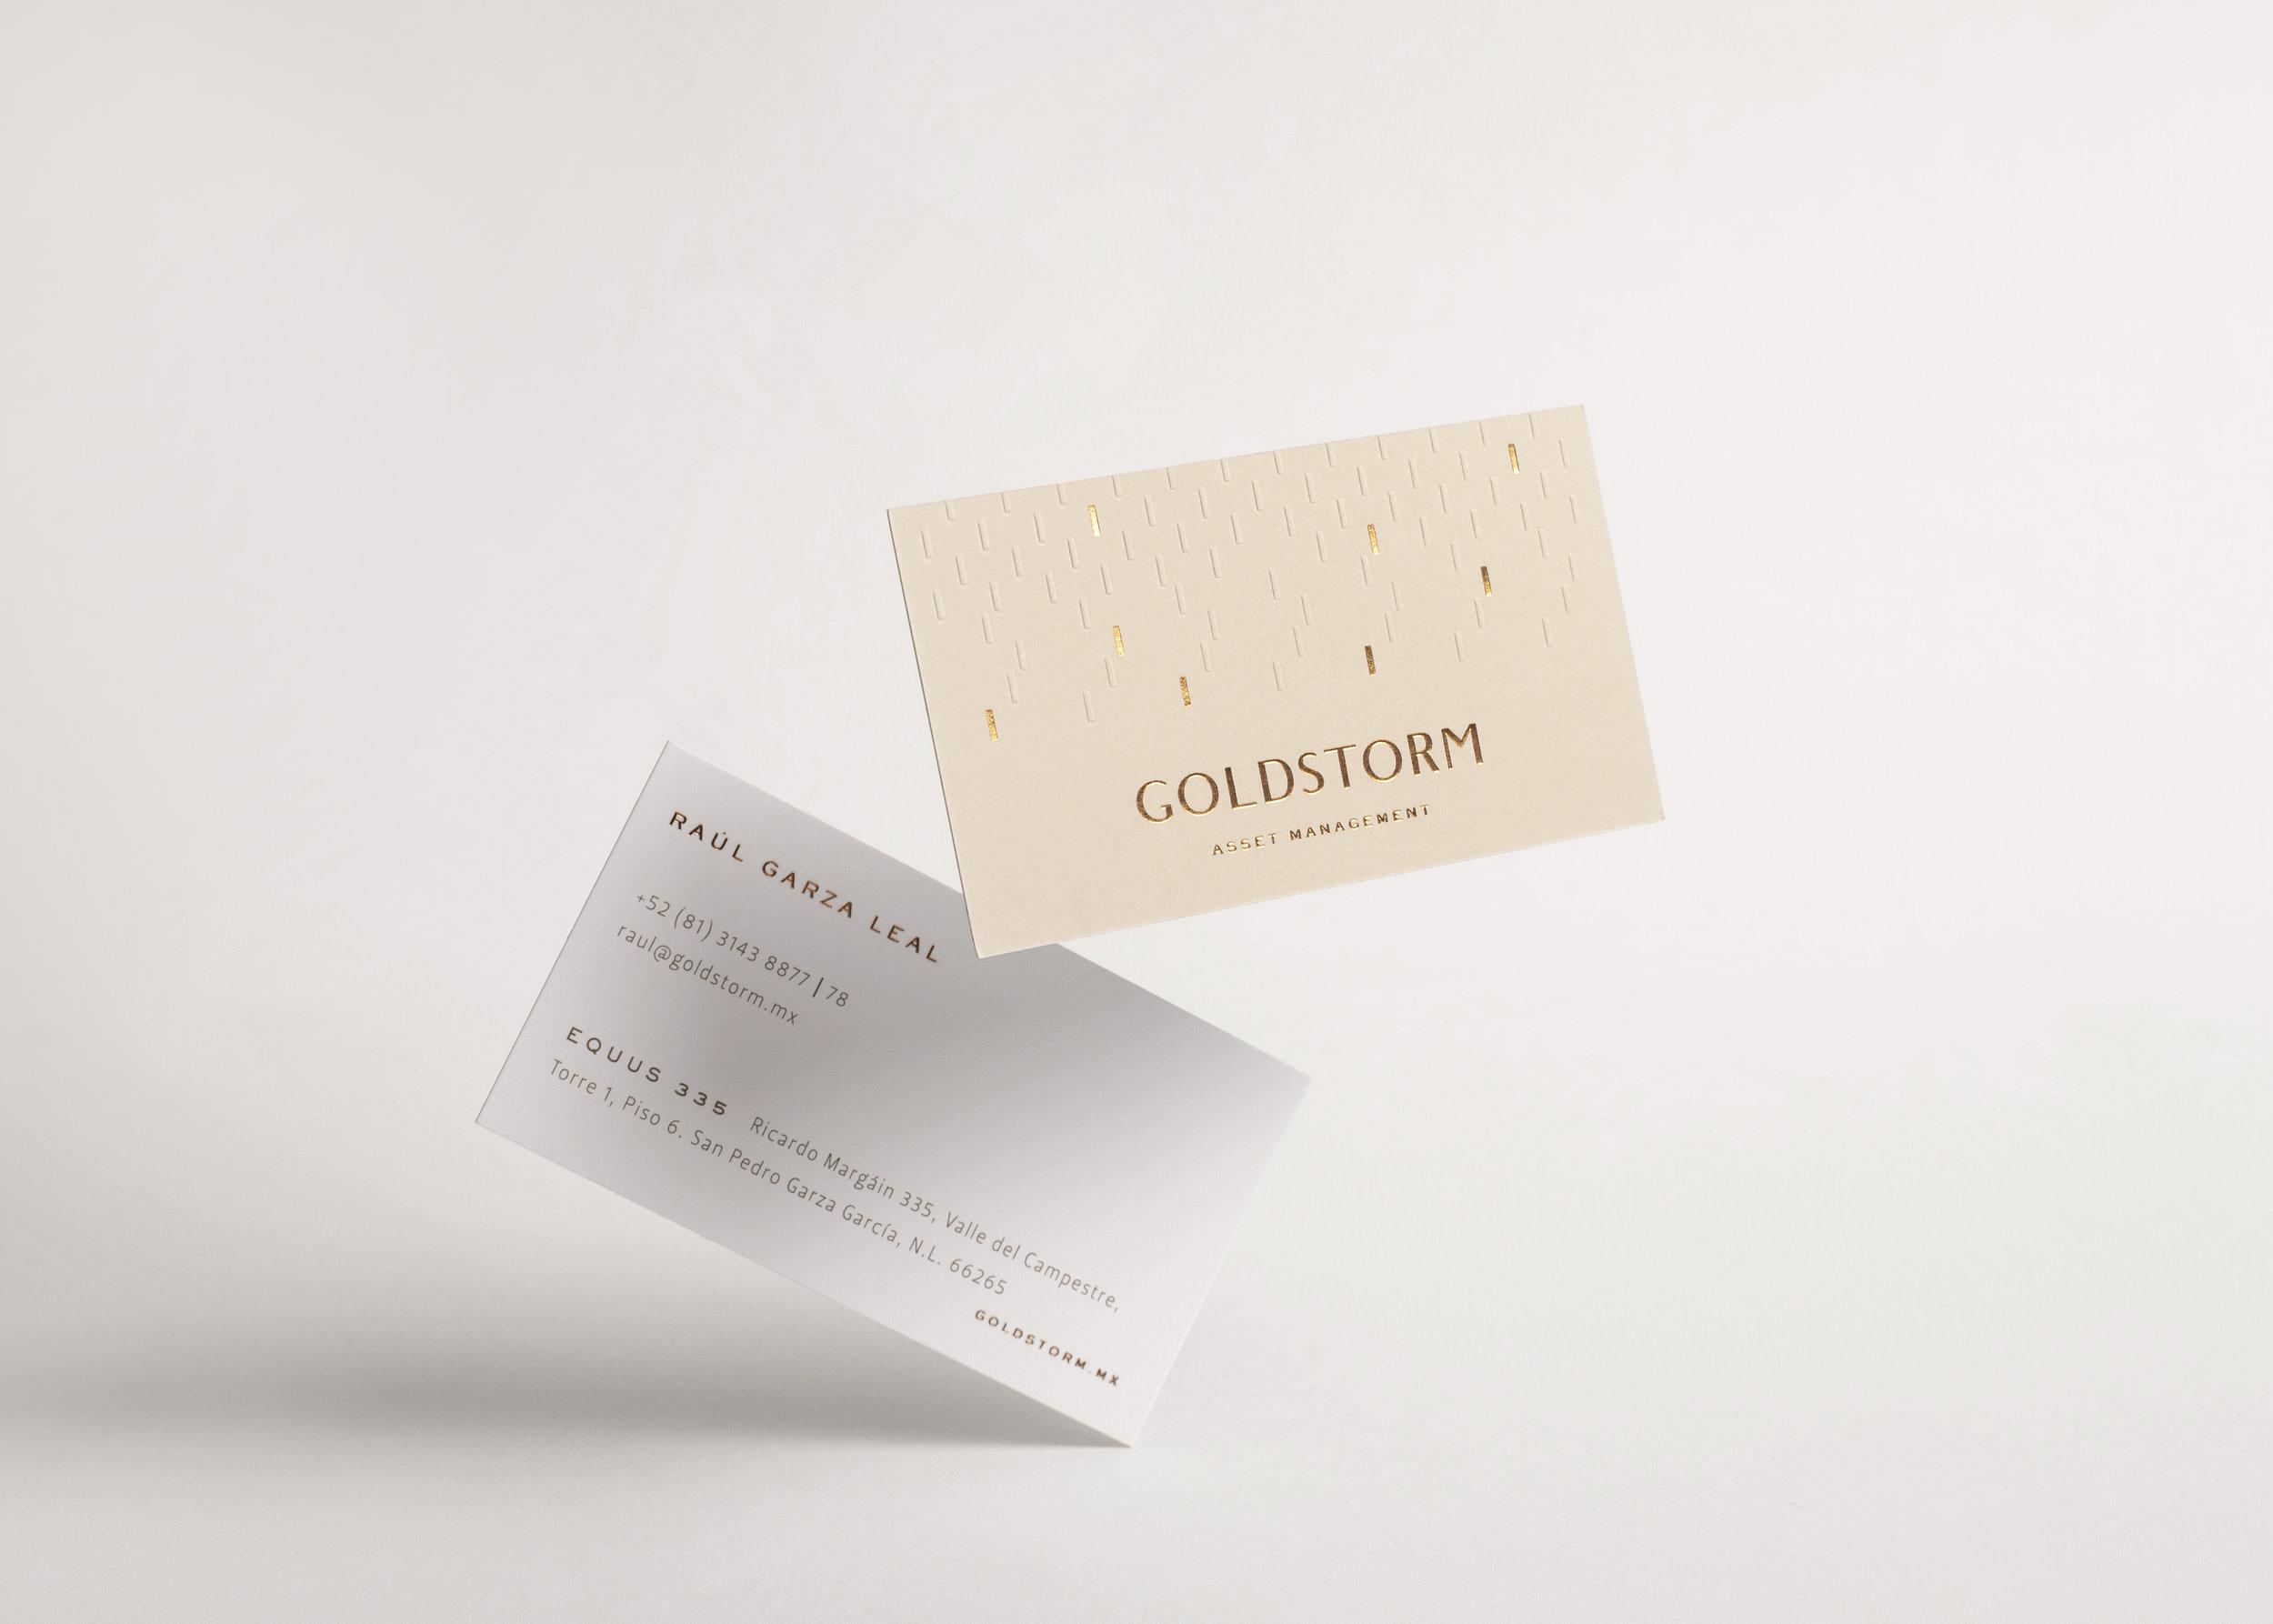 LAT_Goldstorm_BusinessCards01_5x7.jpg